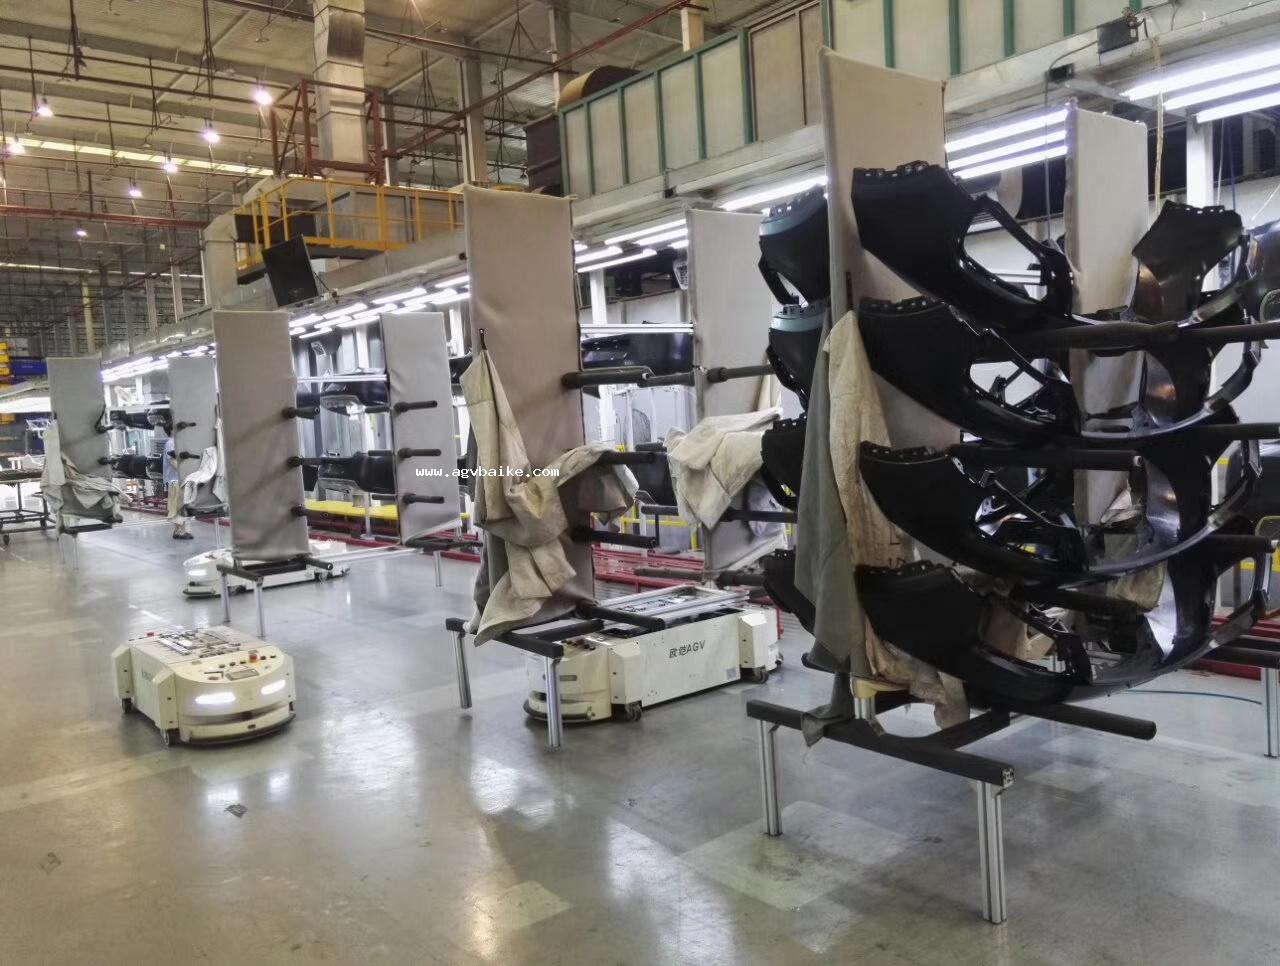 AGV机器人联合运行 自动化再次升级